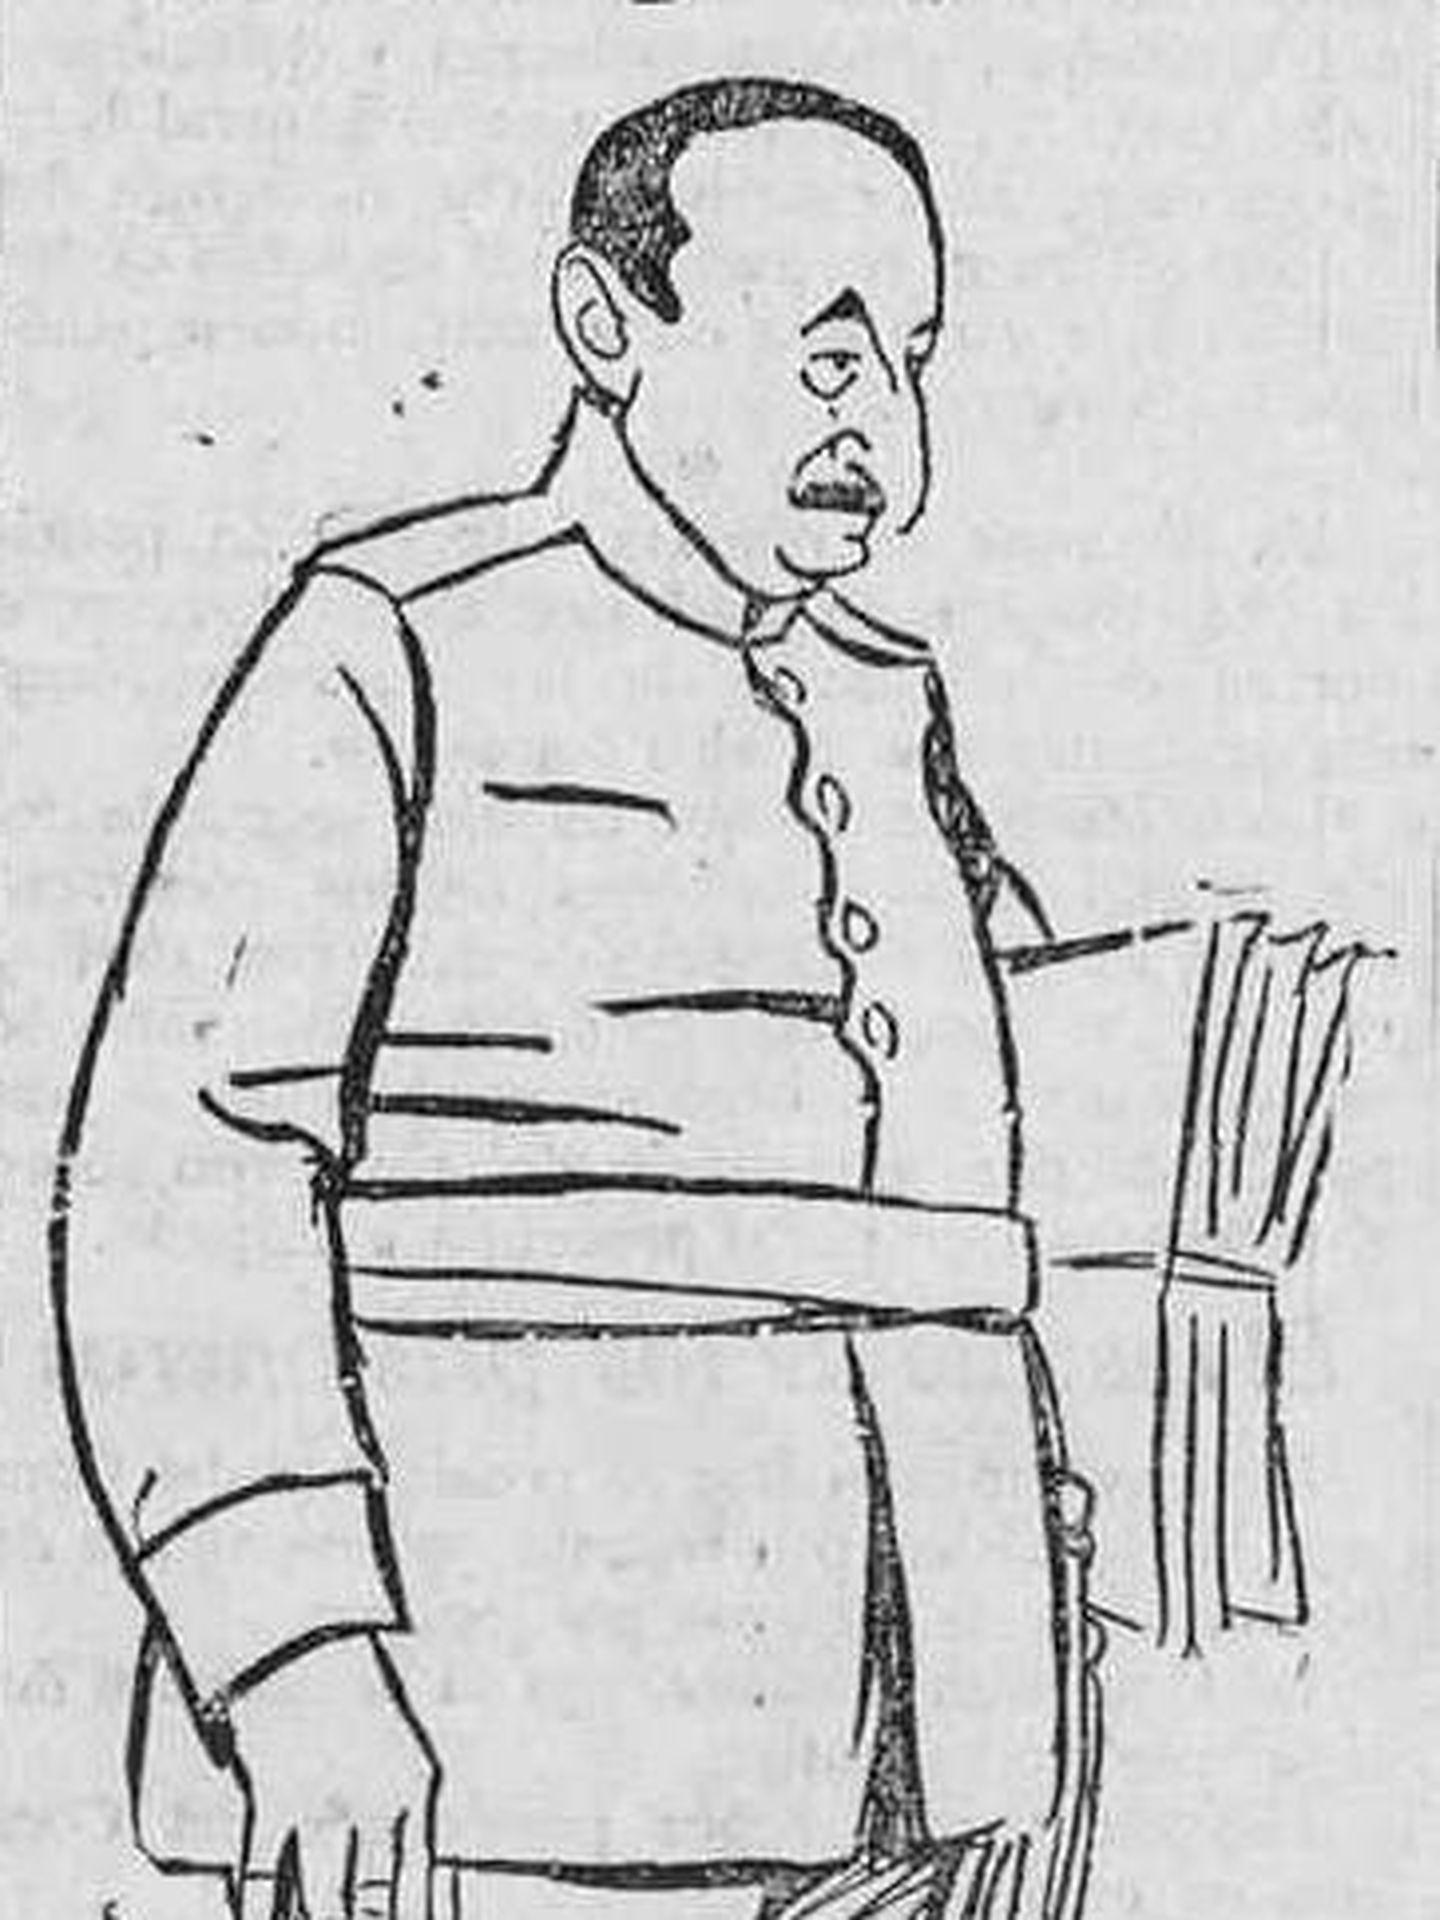 Caricatura de Juan Picasso de 1922. (Wikipedia)